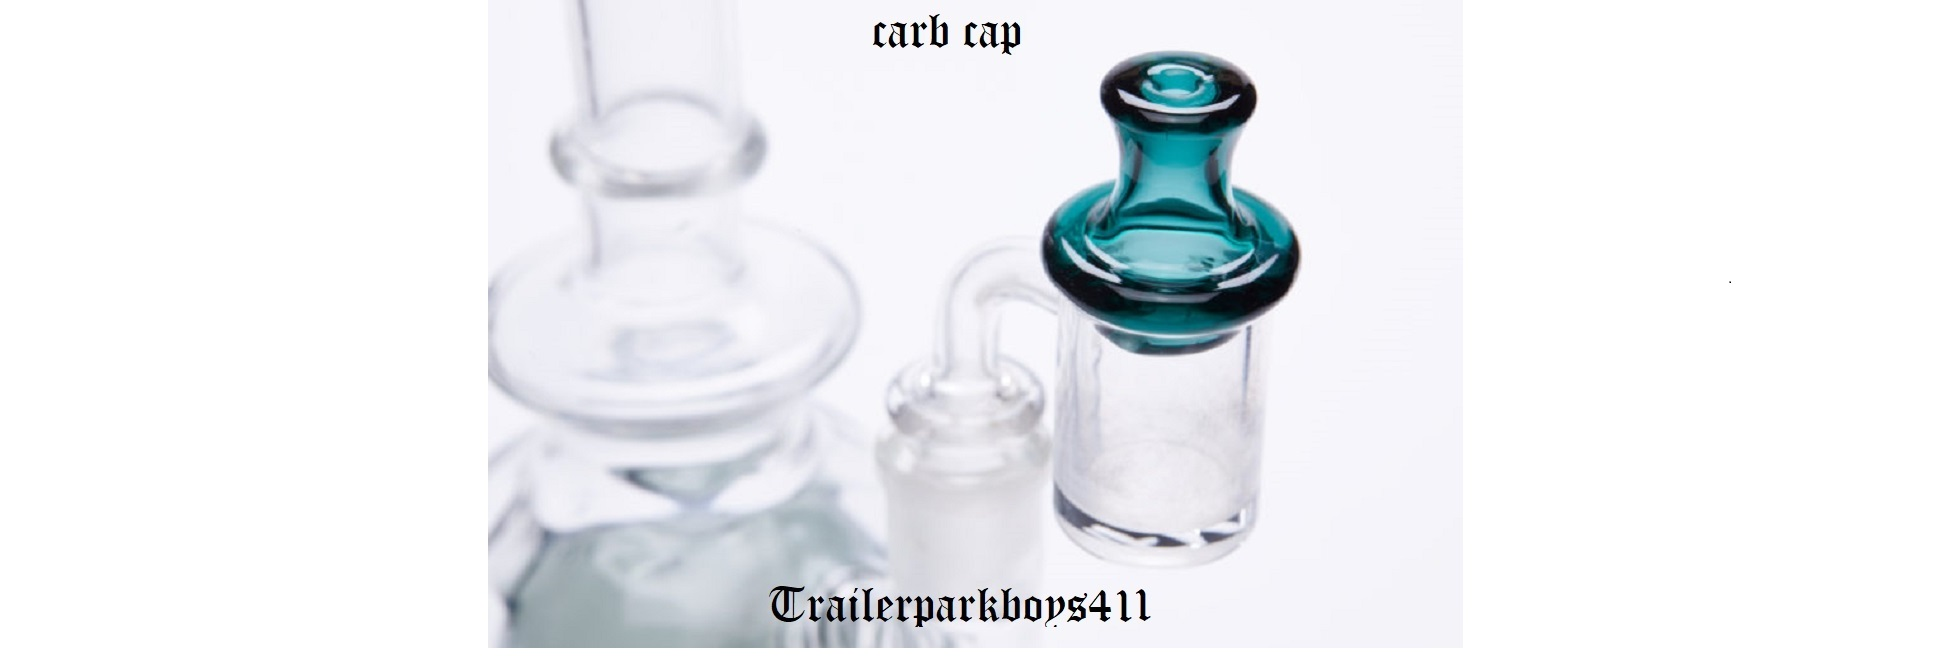 carb cap